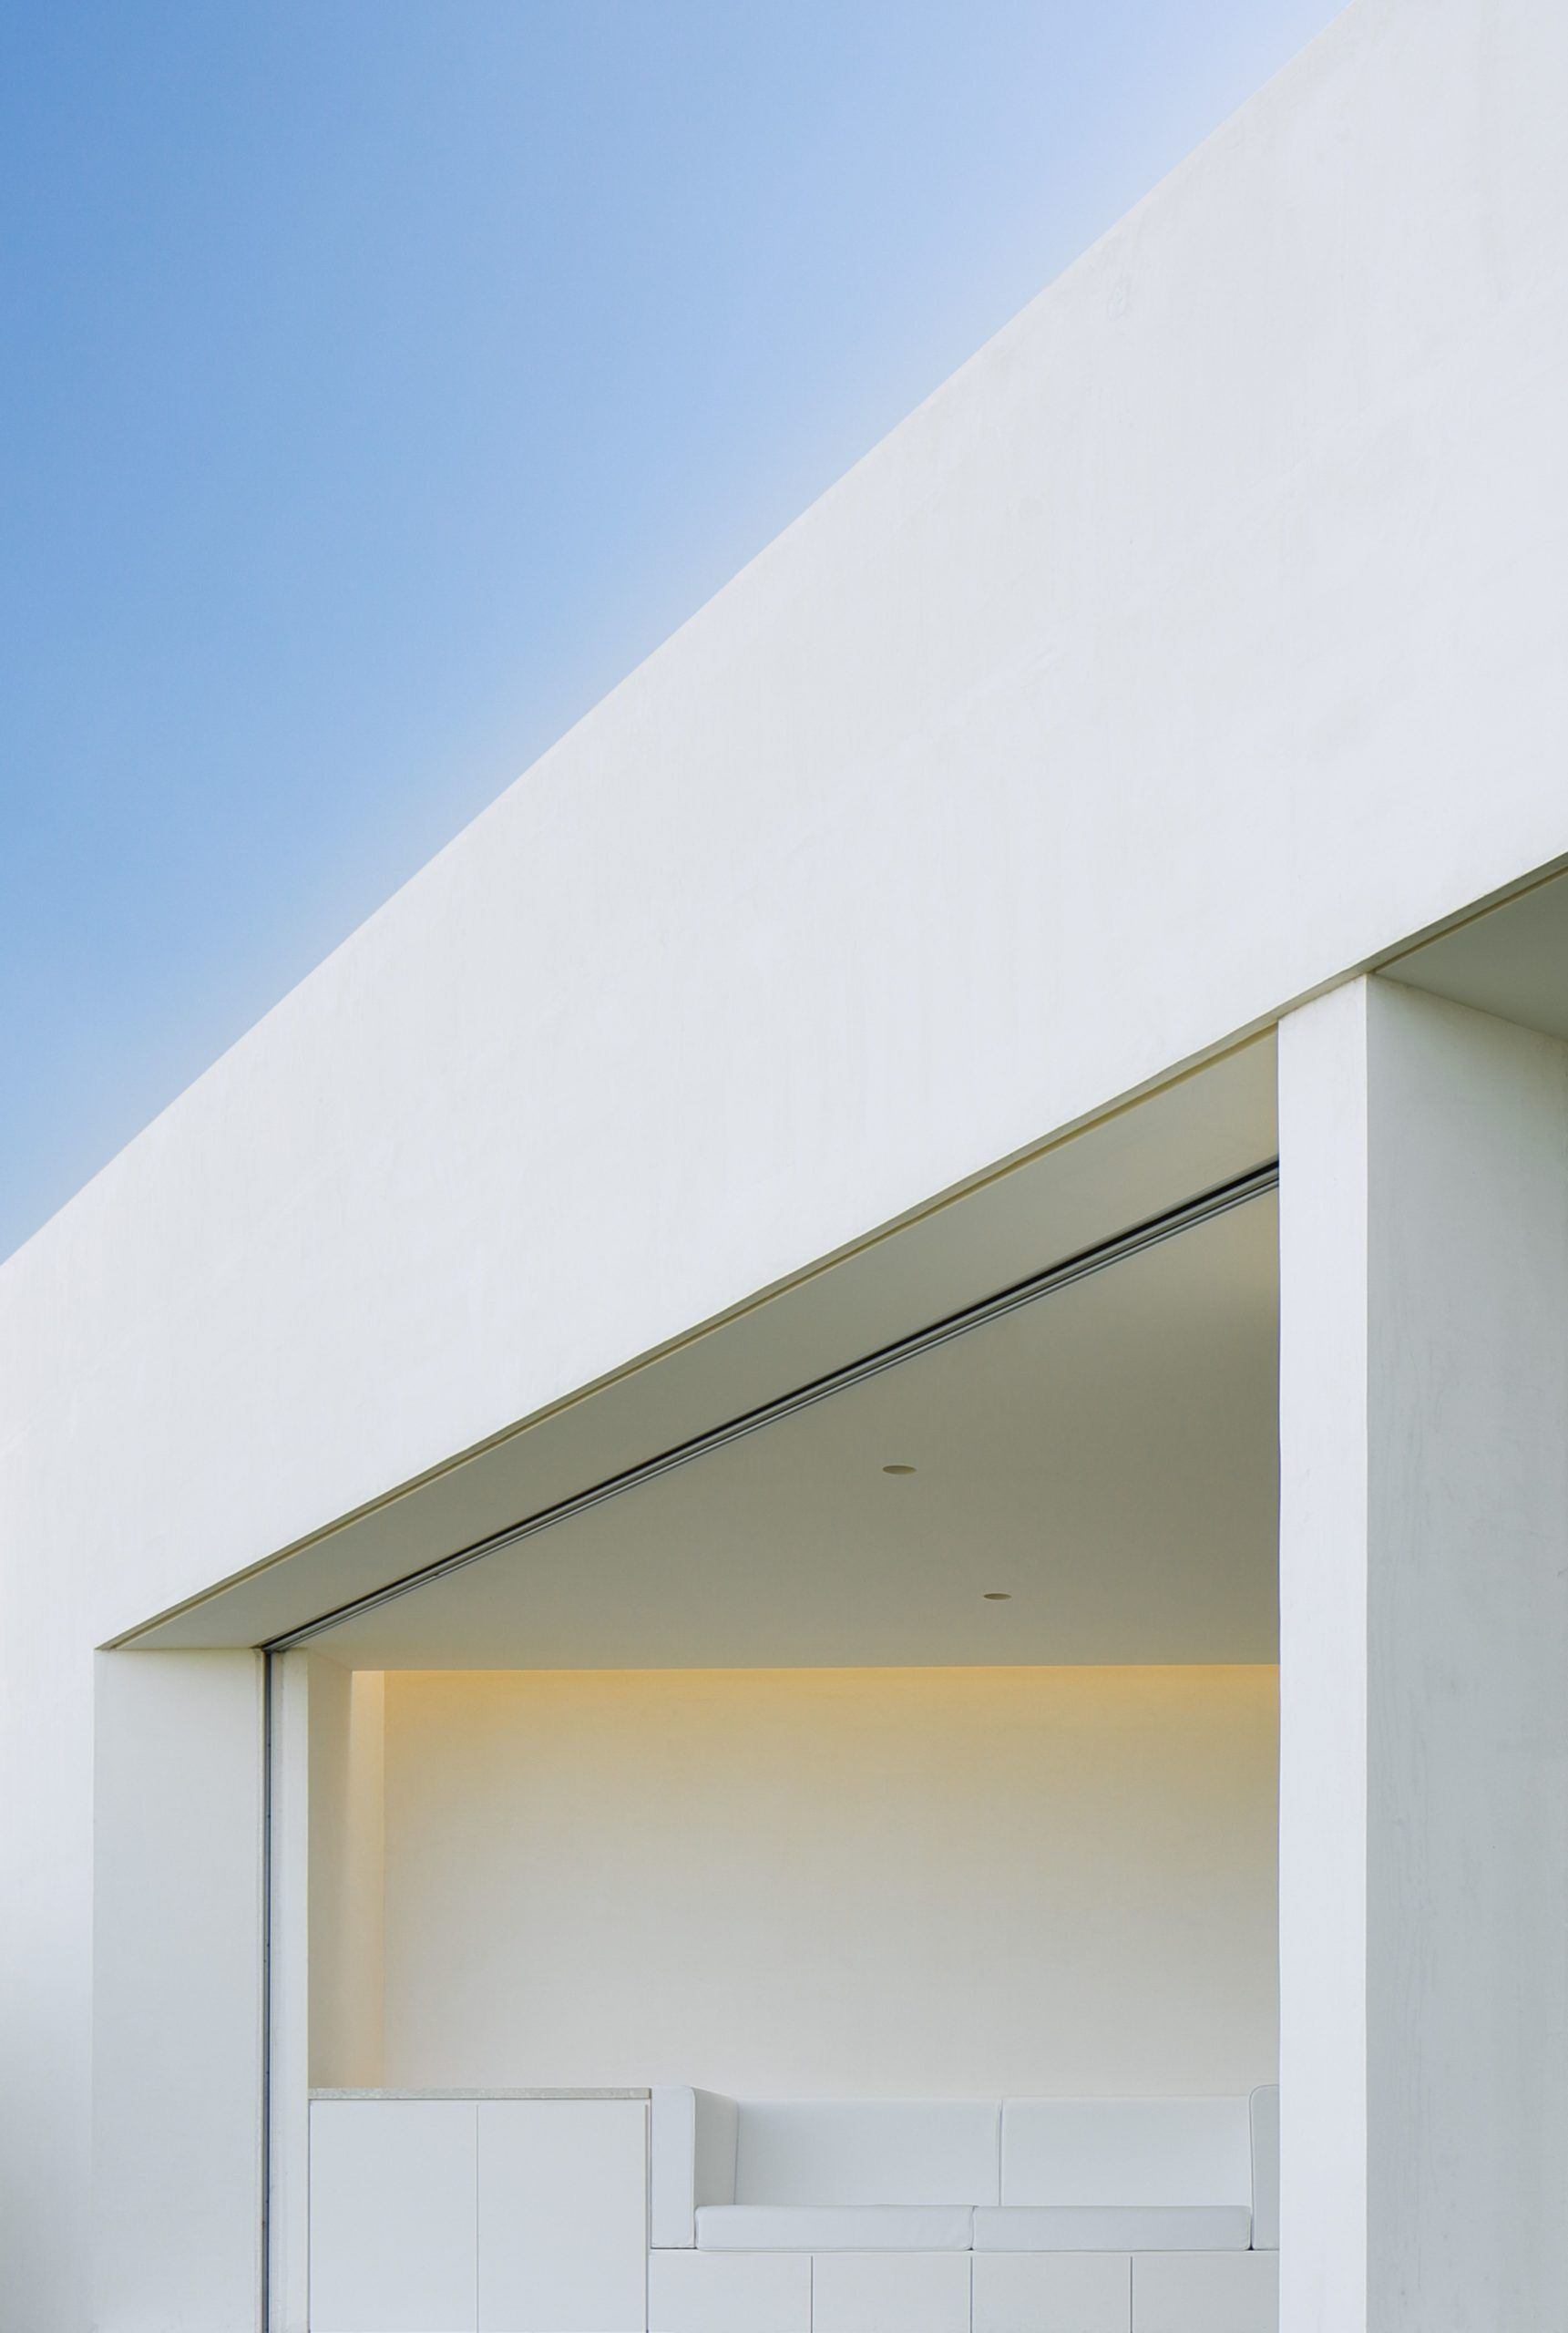 John Pawson - Okinawa House - John Pawson – Okinawa House    John Pawson – Okinawa House   - #Architects #ArchitecturalModels #architecture #CarloScarpa #ChineseArchitecture #DanielLibeskind #Facades #FuturisticArchitecture #House #John #JohnPawson #KengoKuma #ModernArchitecture #Okinawa #OscarNiemeyer #Pavilion #Pawson #PeterZumthor #RichardNeutra #SantiagoCalatrava #ShigeruBan #StevenHoll #TadaoAndo #ZahaHadid #ZahaHadidArchitects